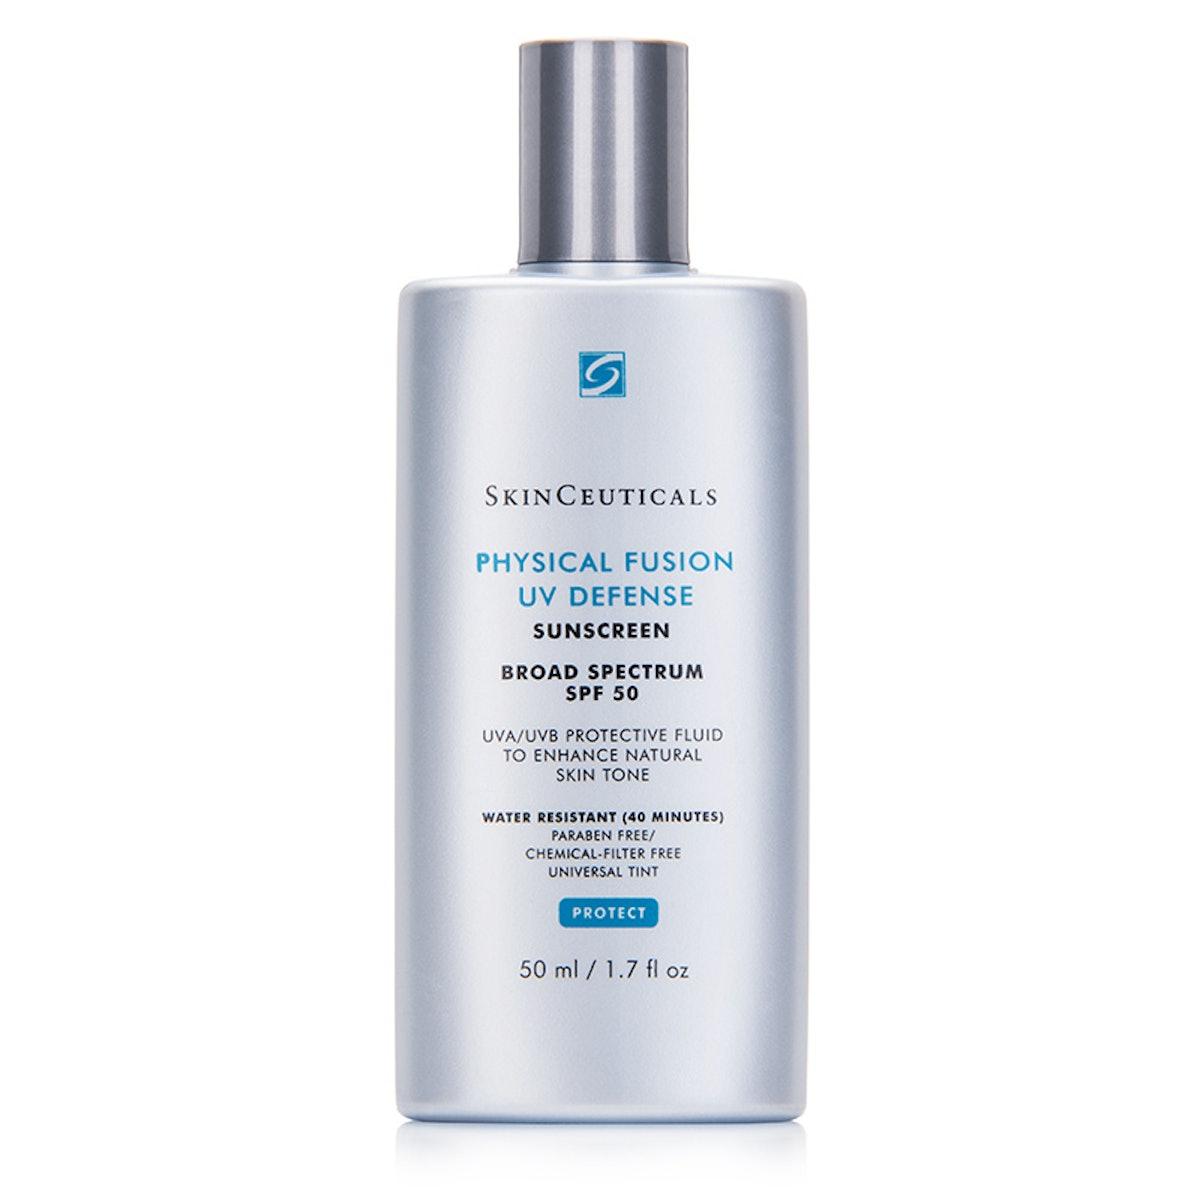 SkinCeuticals Physical Fusion UV Defense